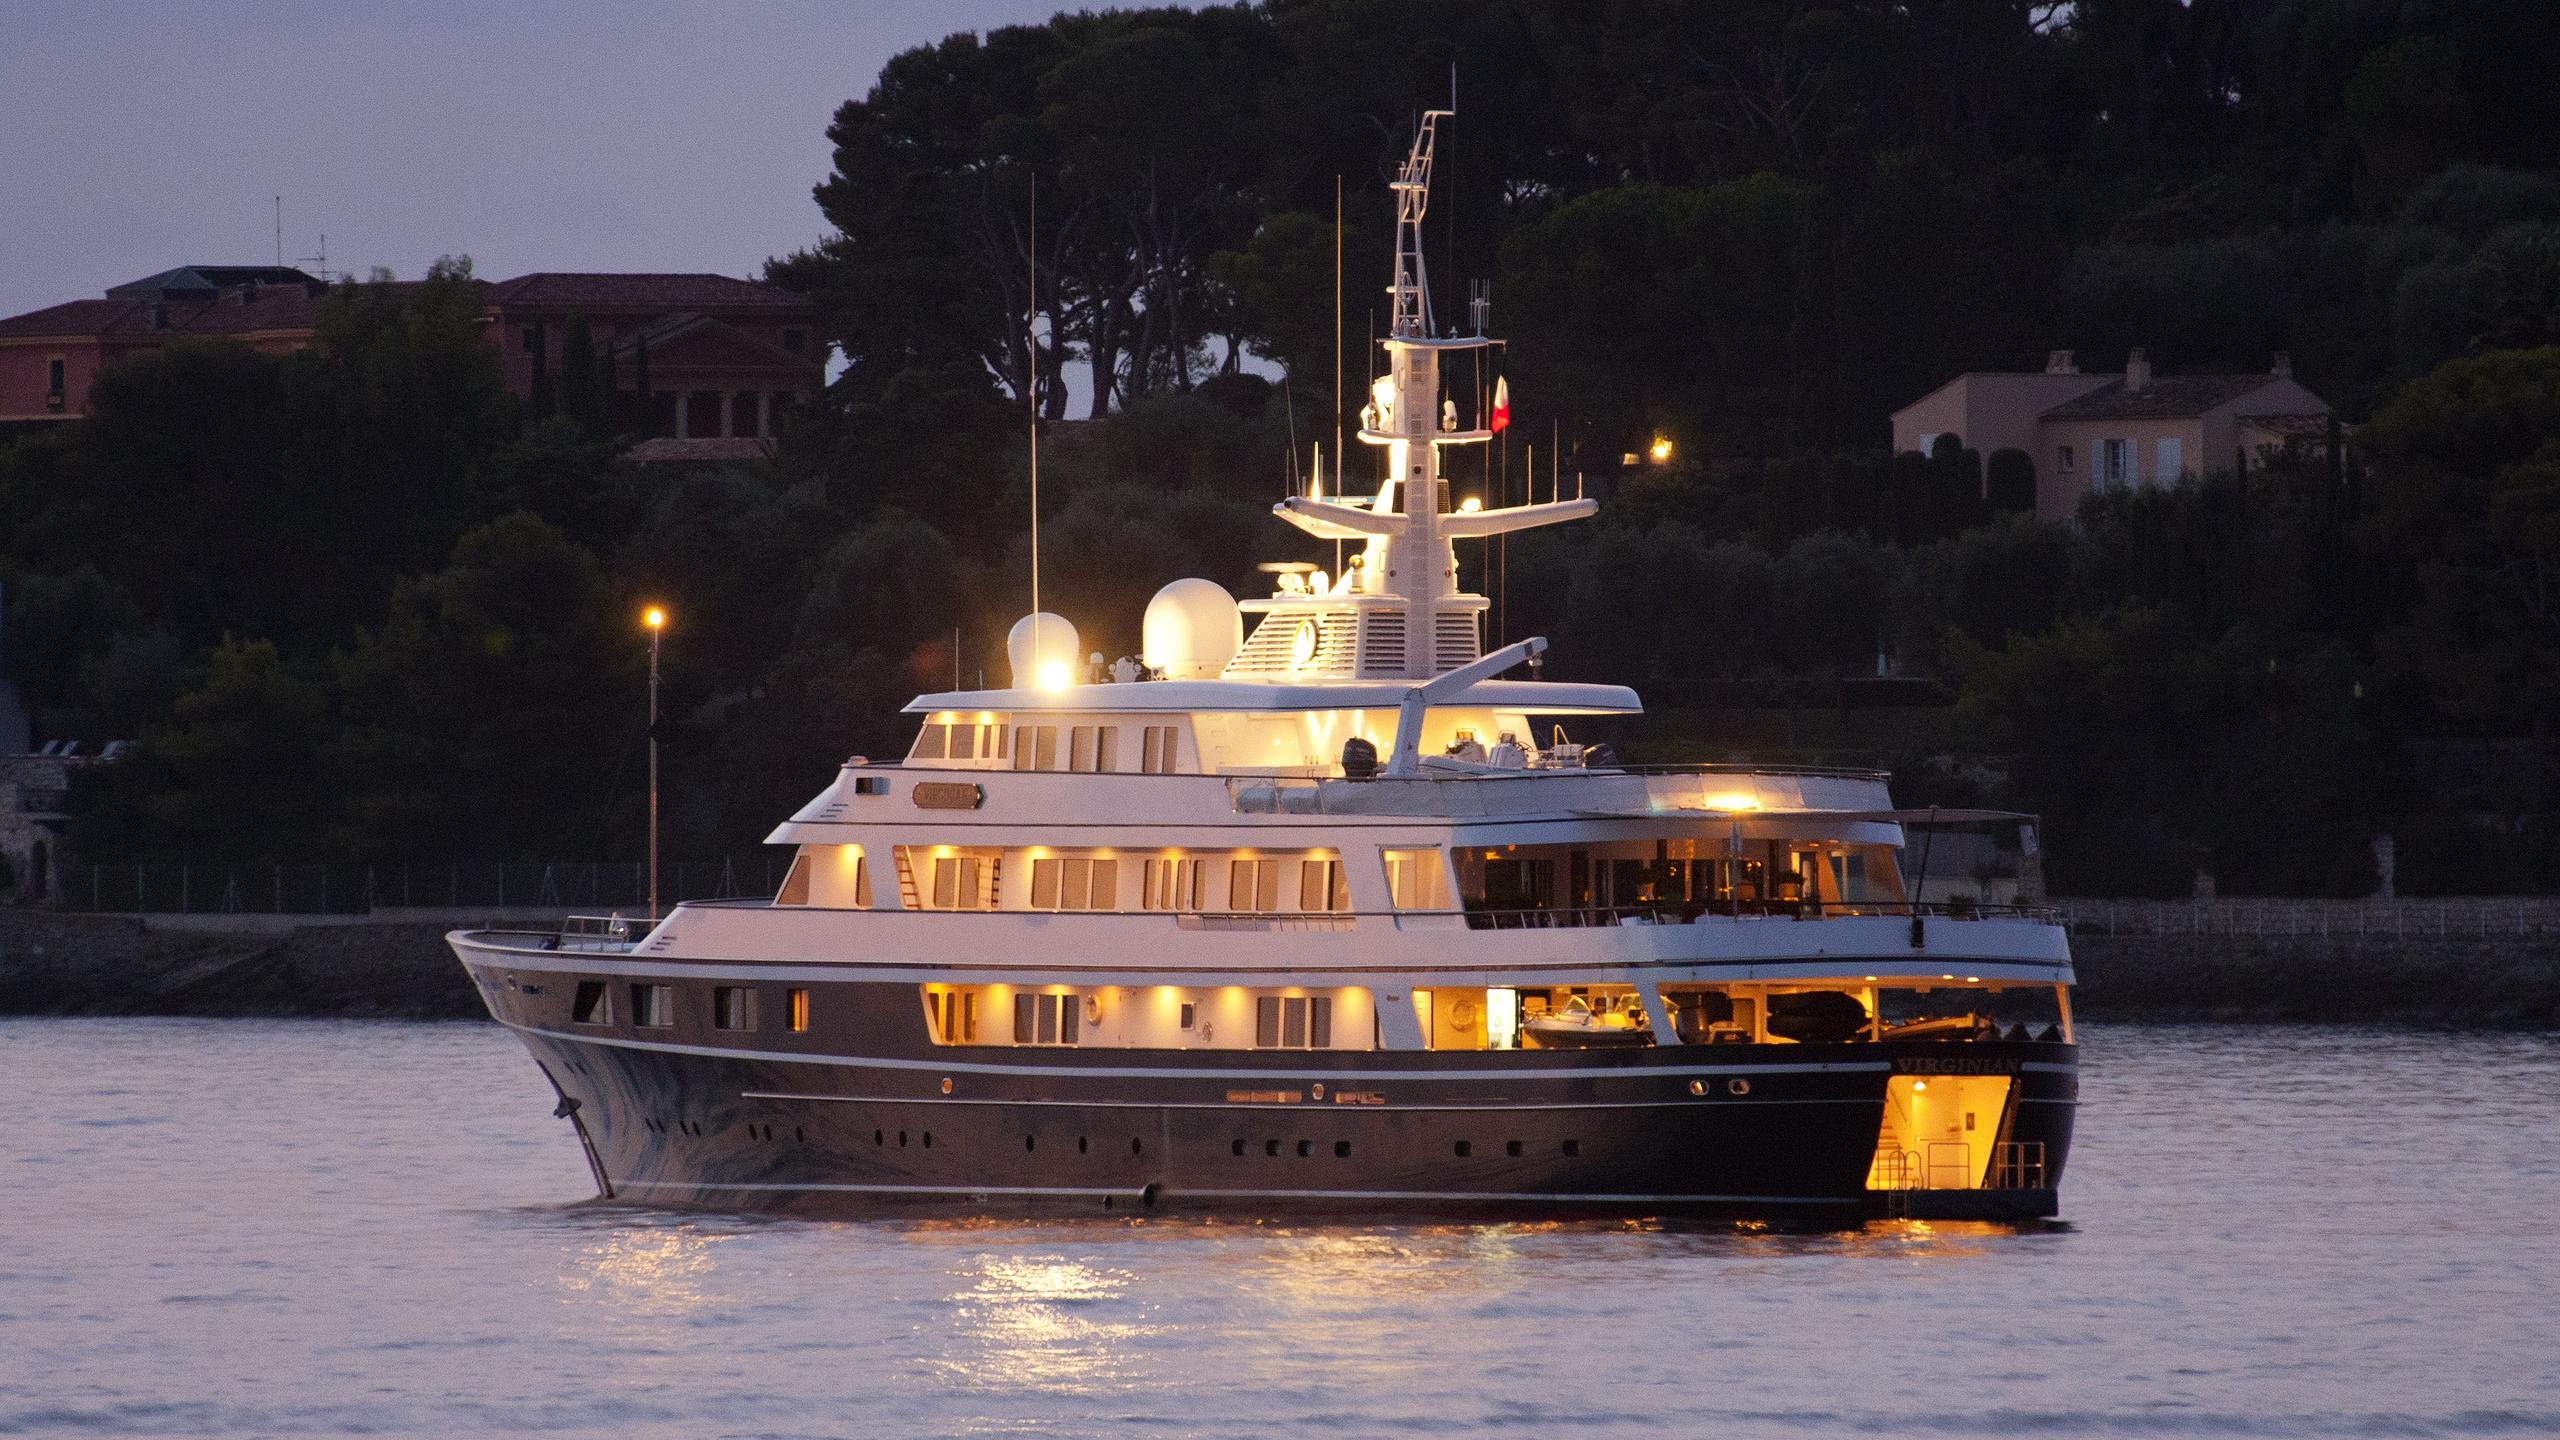 virginian-motor-yacht-feadship-1991-62m-stern-by-night